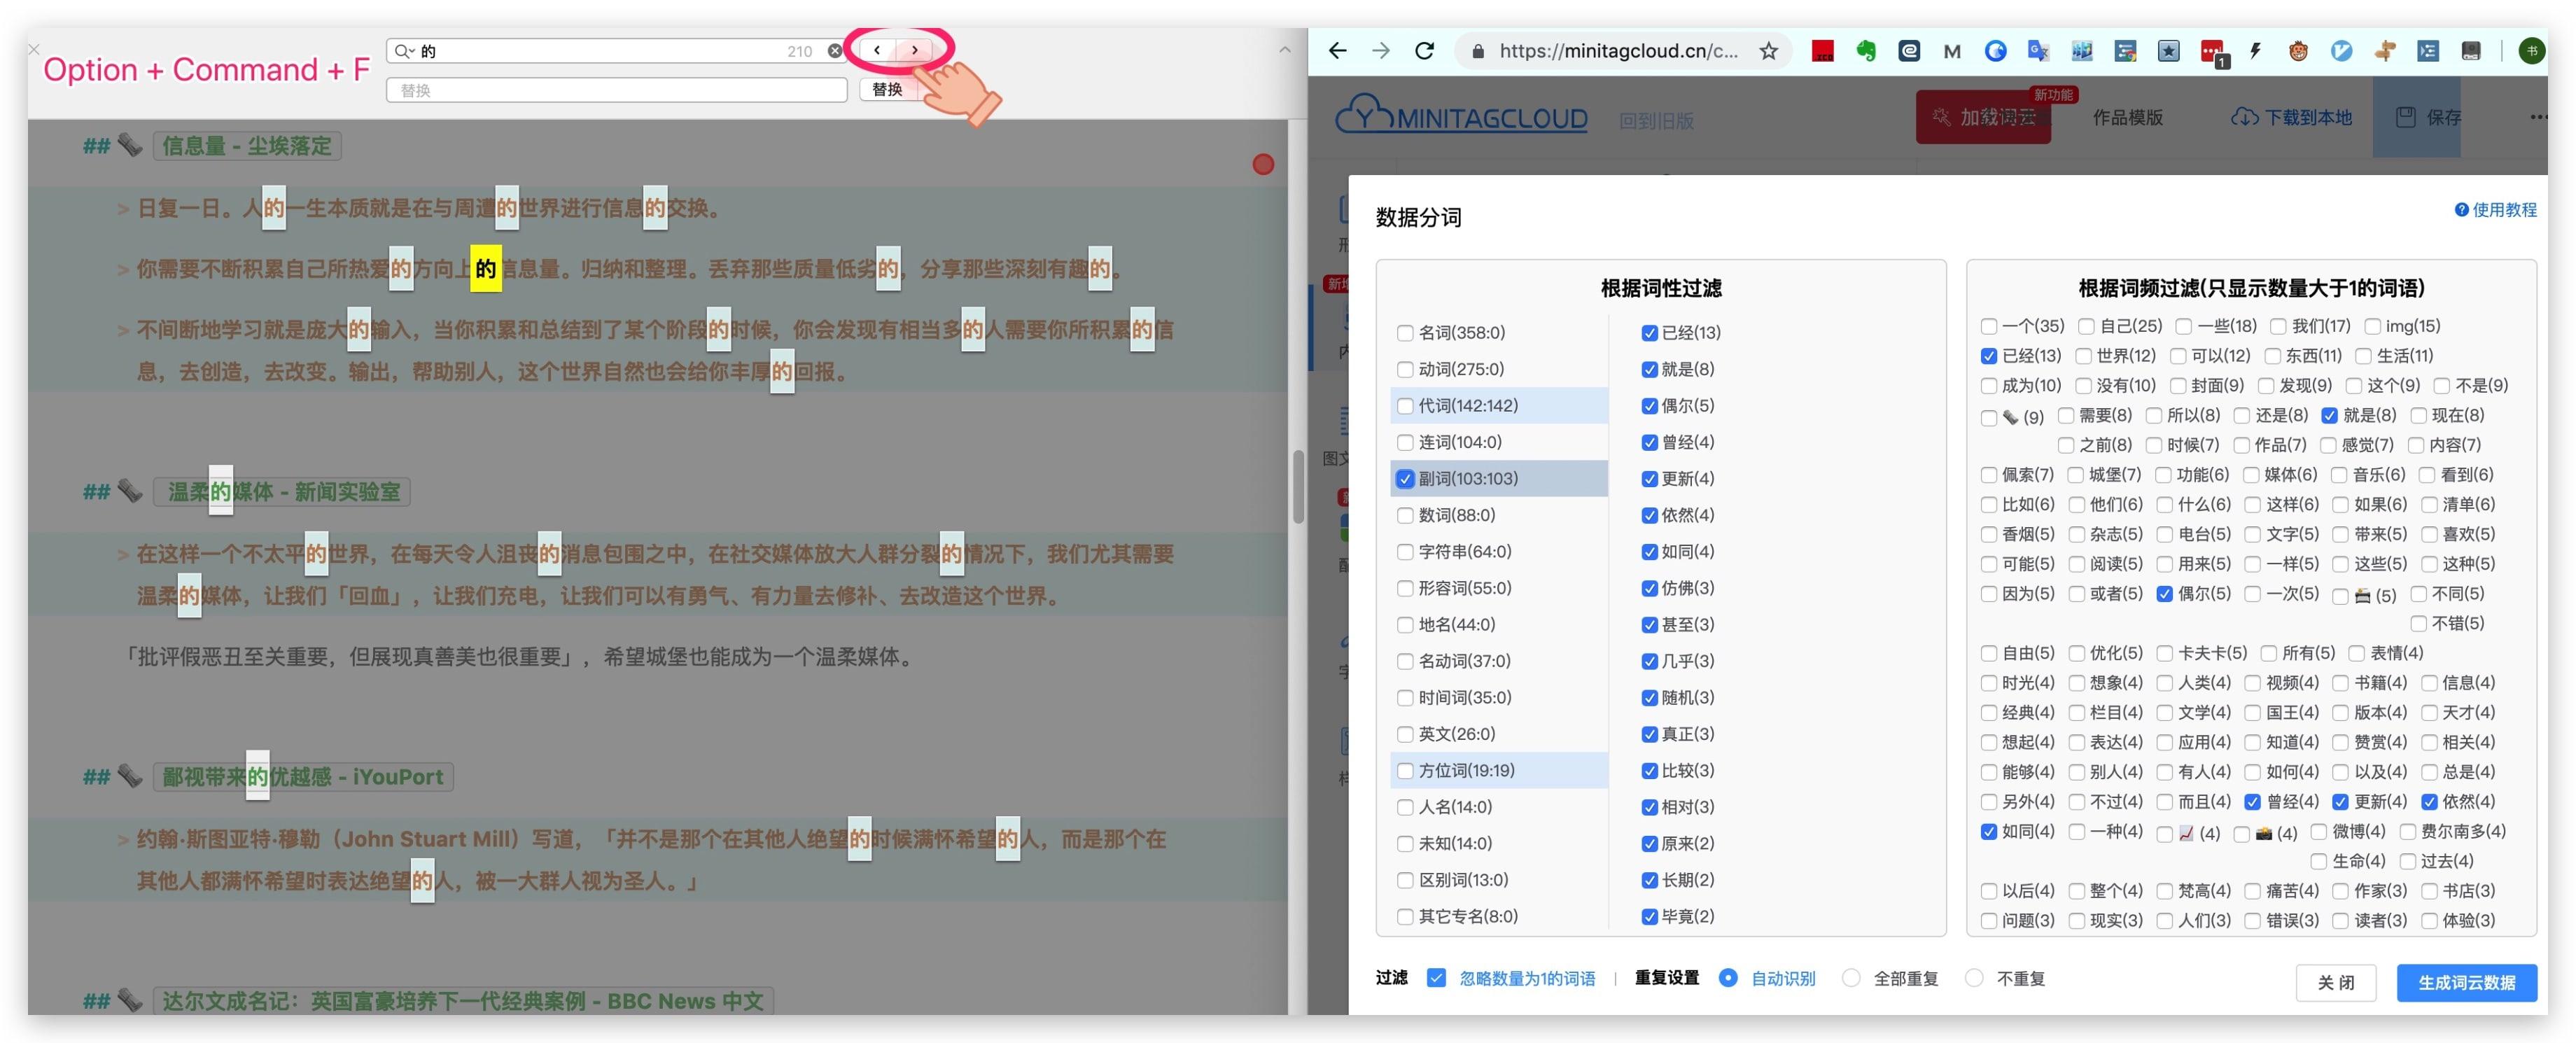 Xnip2019-05-18_06-16-22.jpg-400.7kB